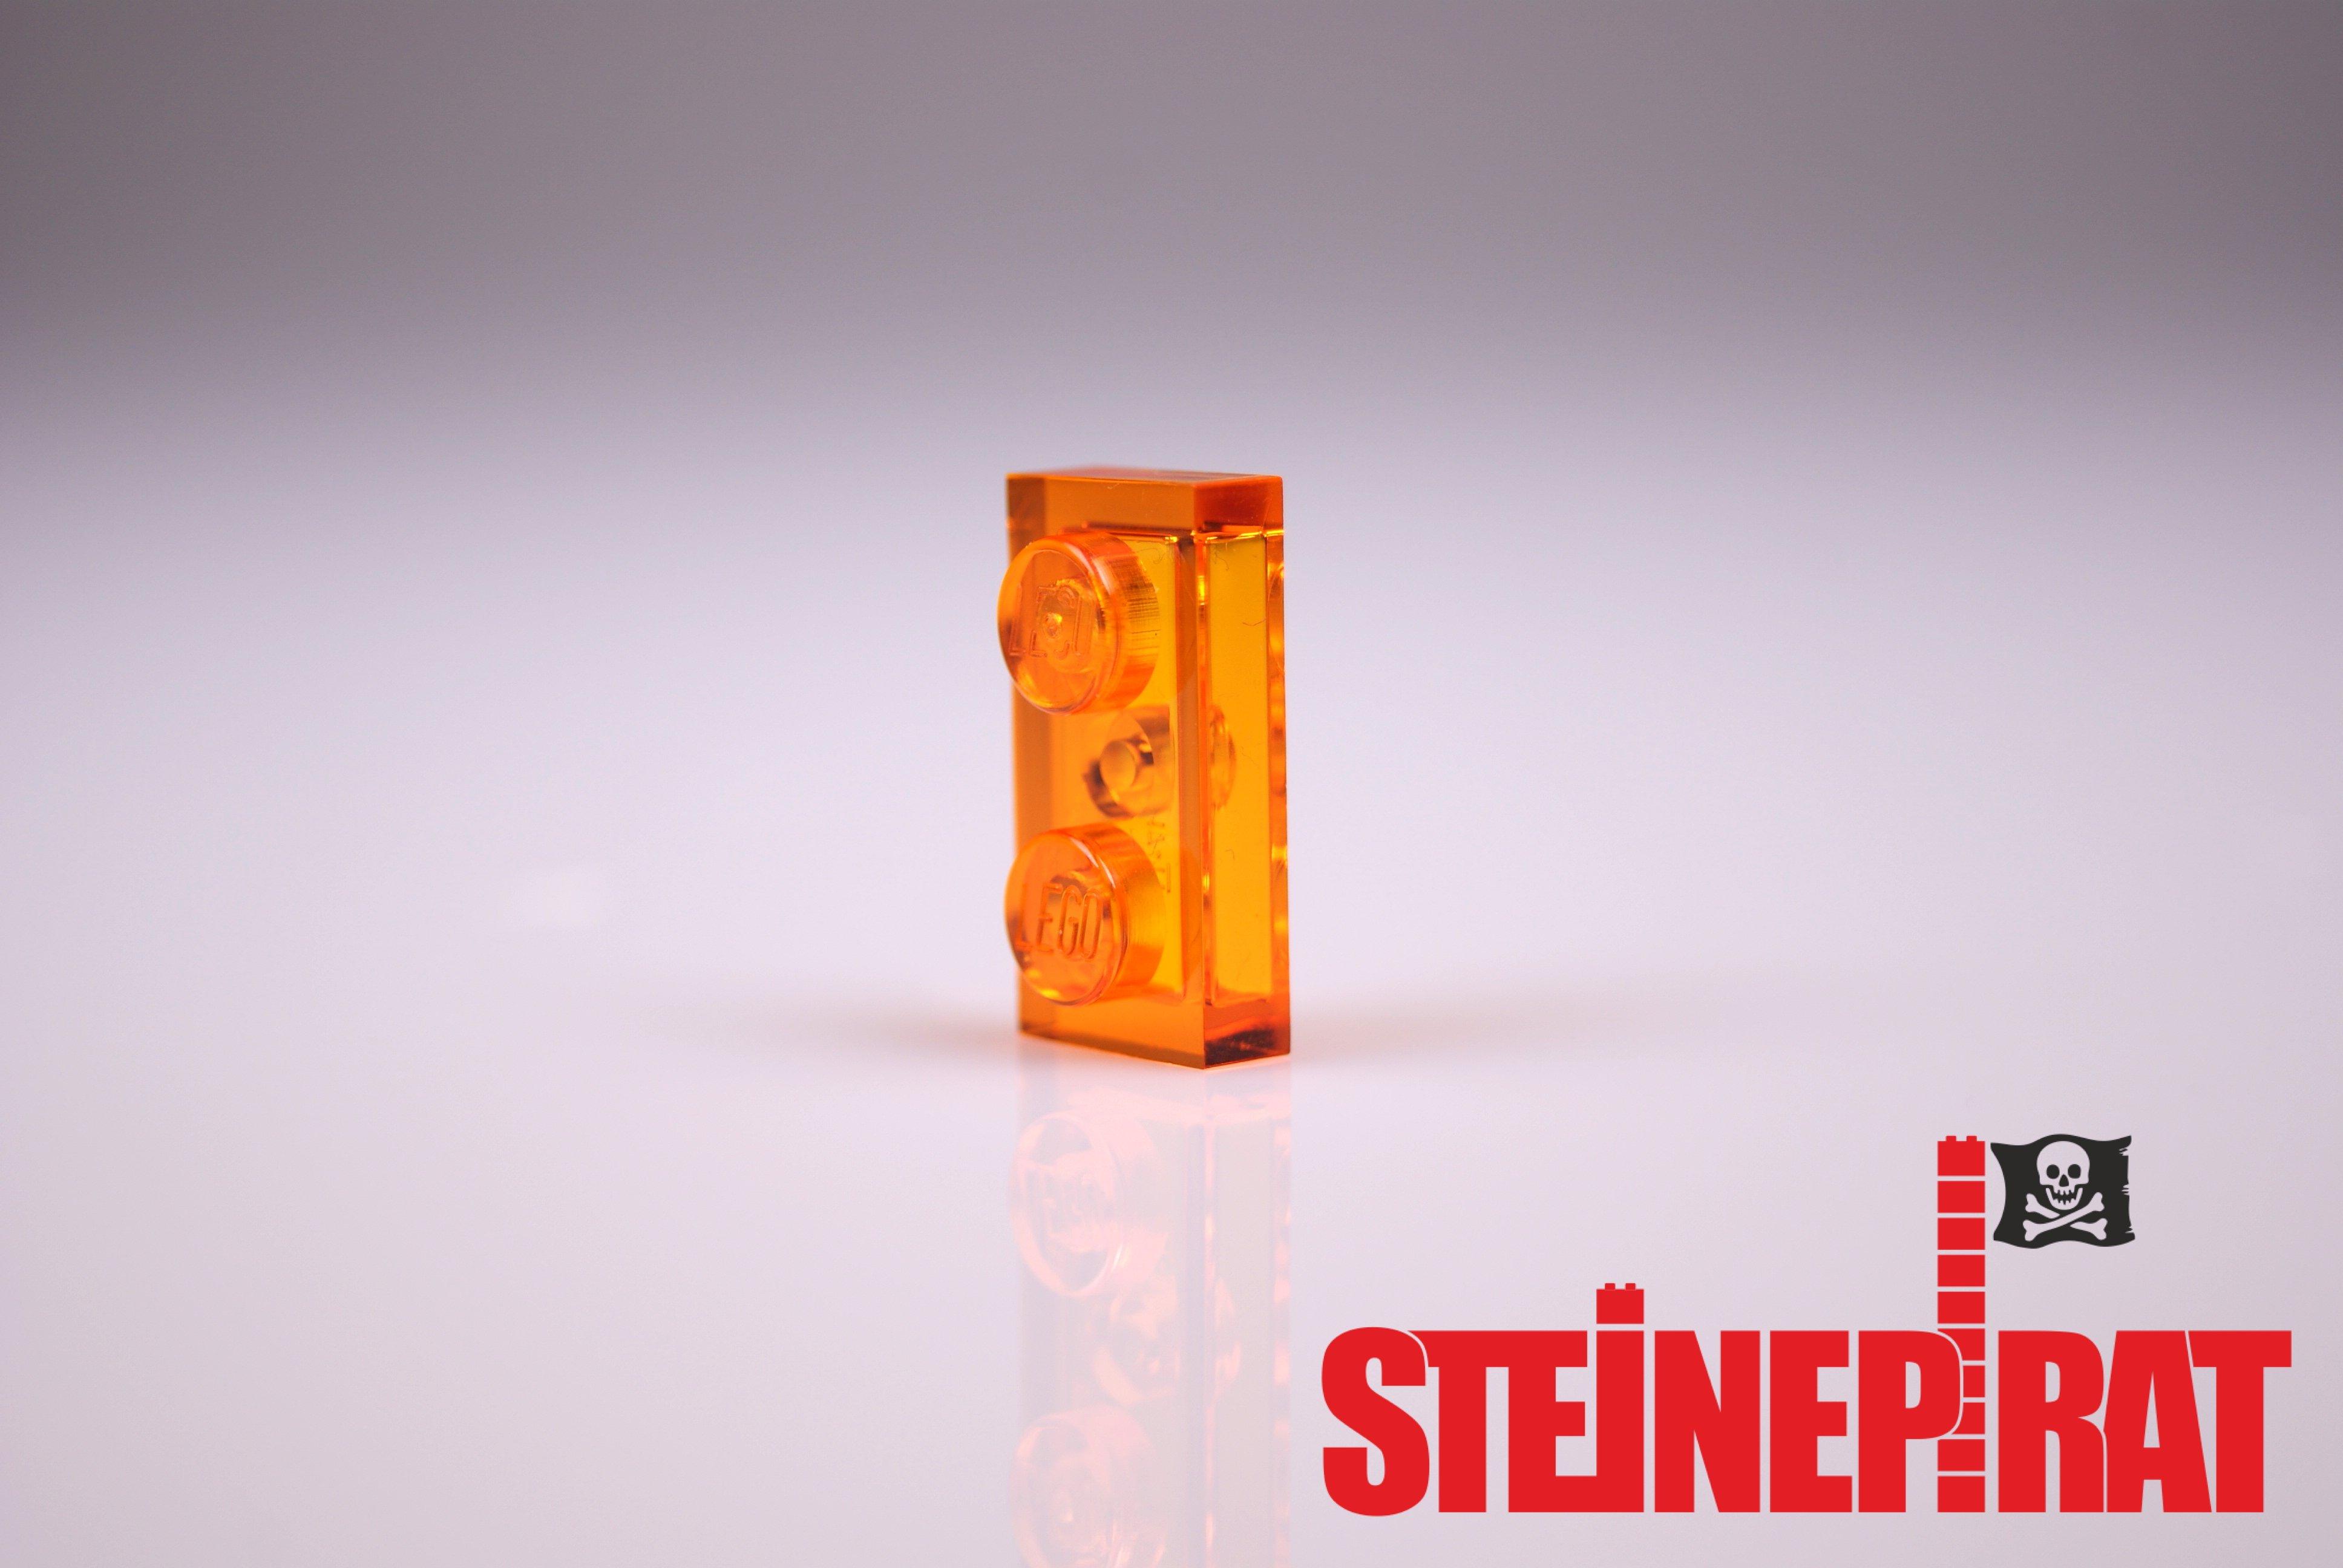 LEGO 10 x Wand Säule 1x2x5 rot red wall brick pillar 2454 245421 4212414